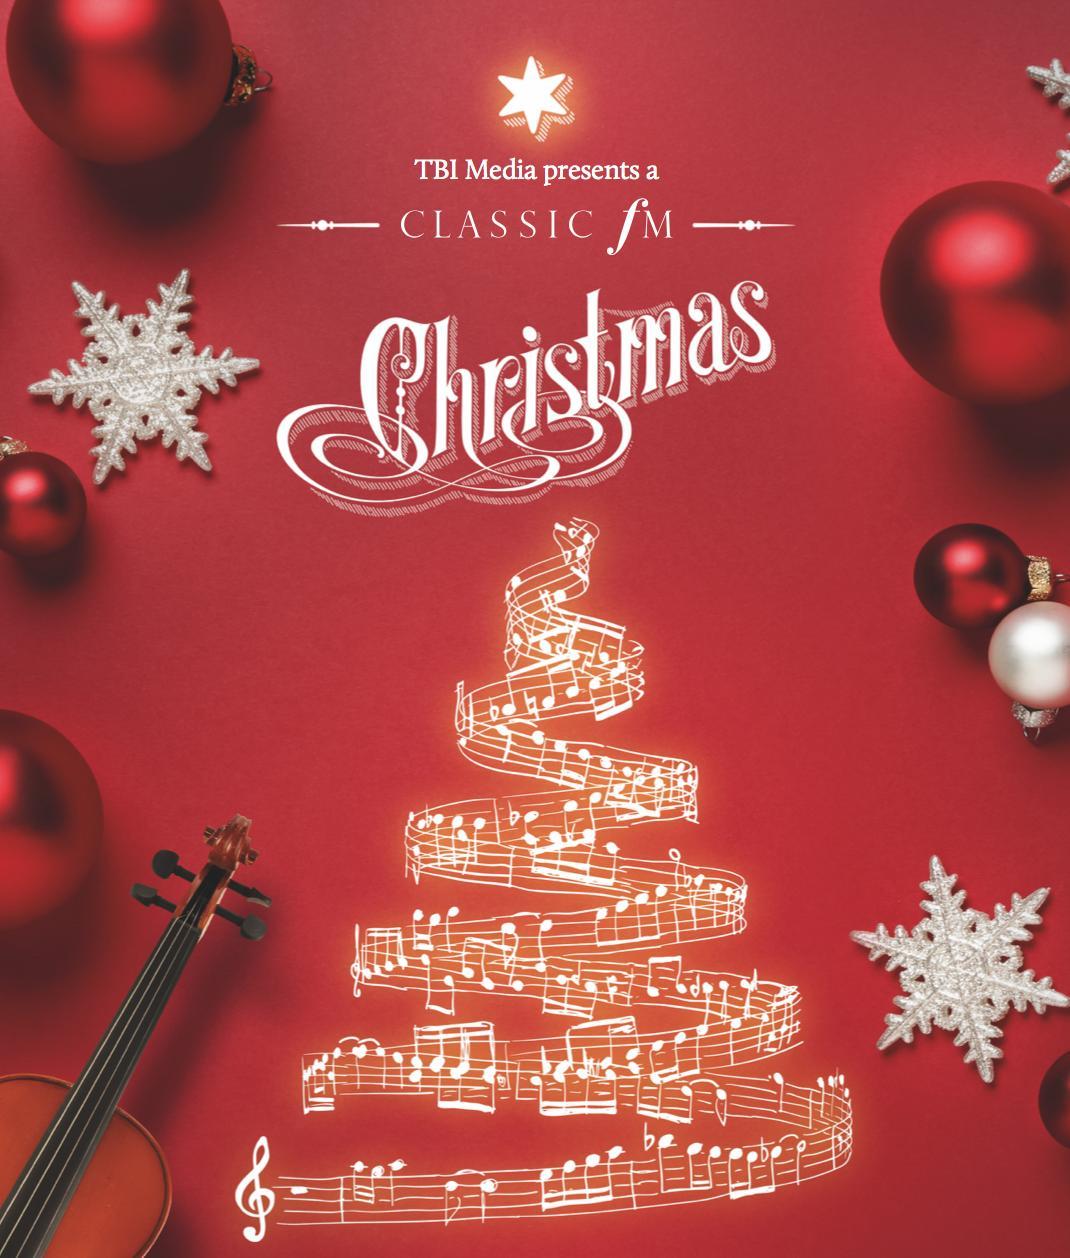 classic fm christmas - Classic Christmas